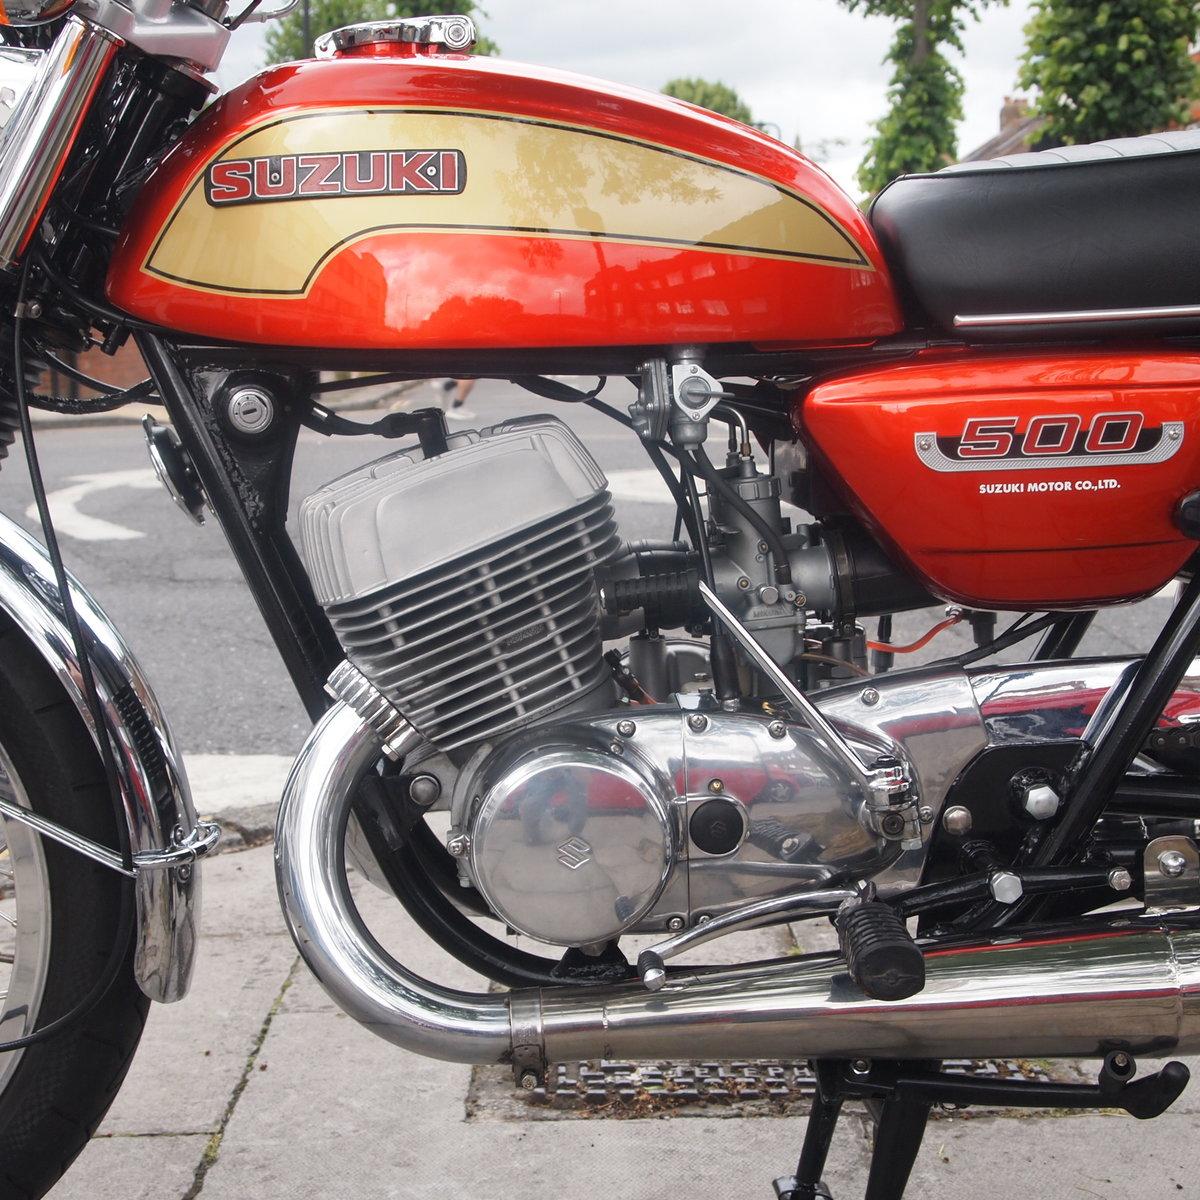 1974 Suzuki T500 In Beautiful Condition SOLD (picture 6 of 6)